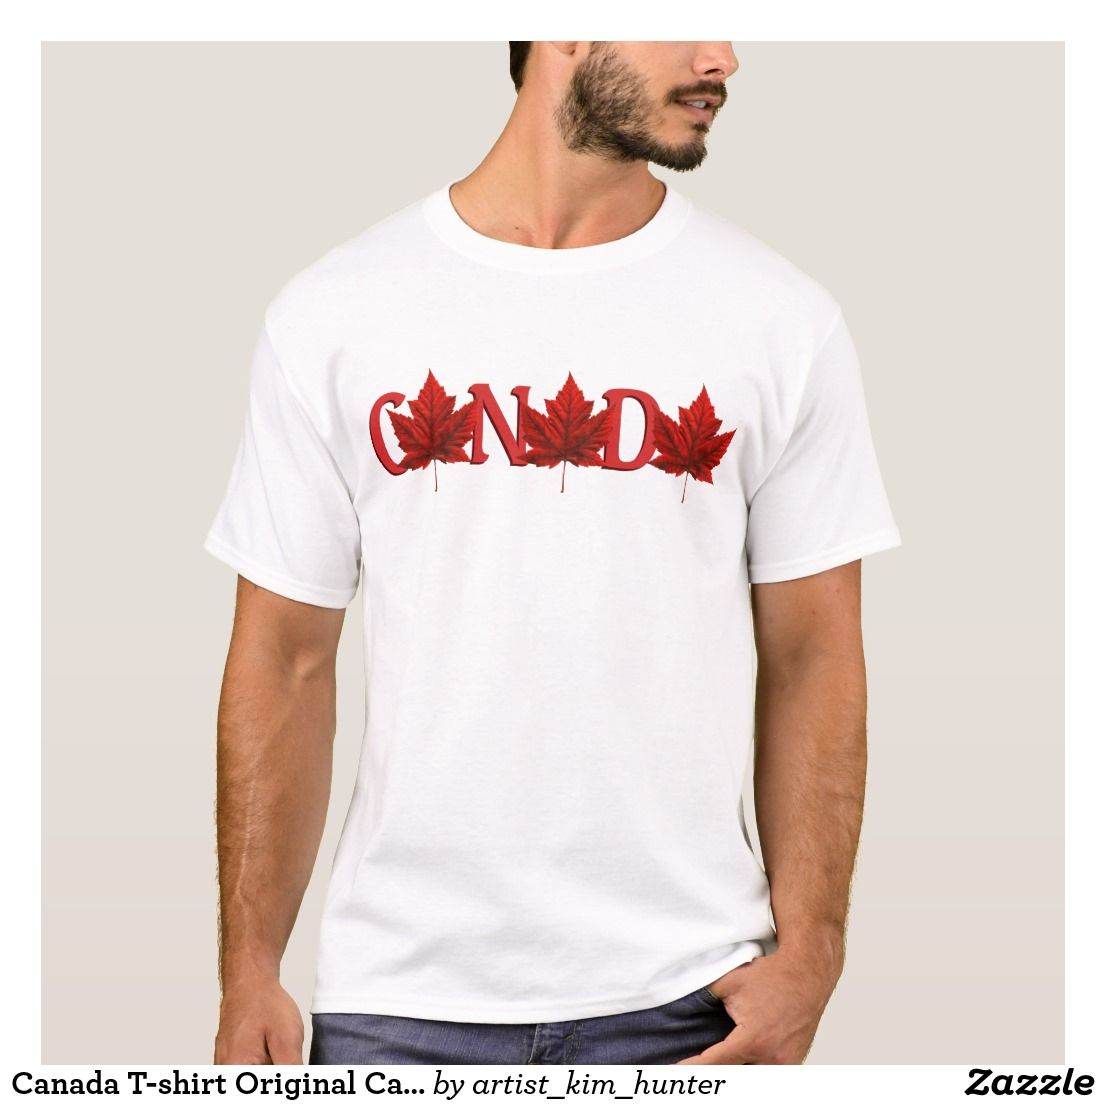 38ab6f566 Canada T-shirt Original Canada Souvenir Shirt   Zazzle.com in 2019 ...